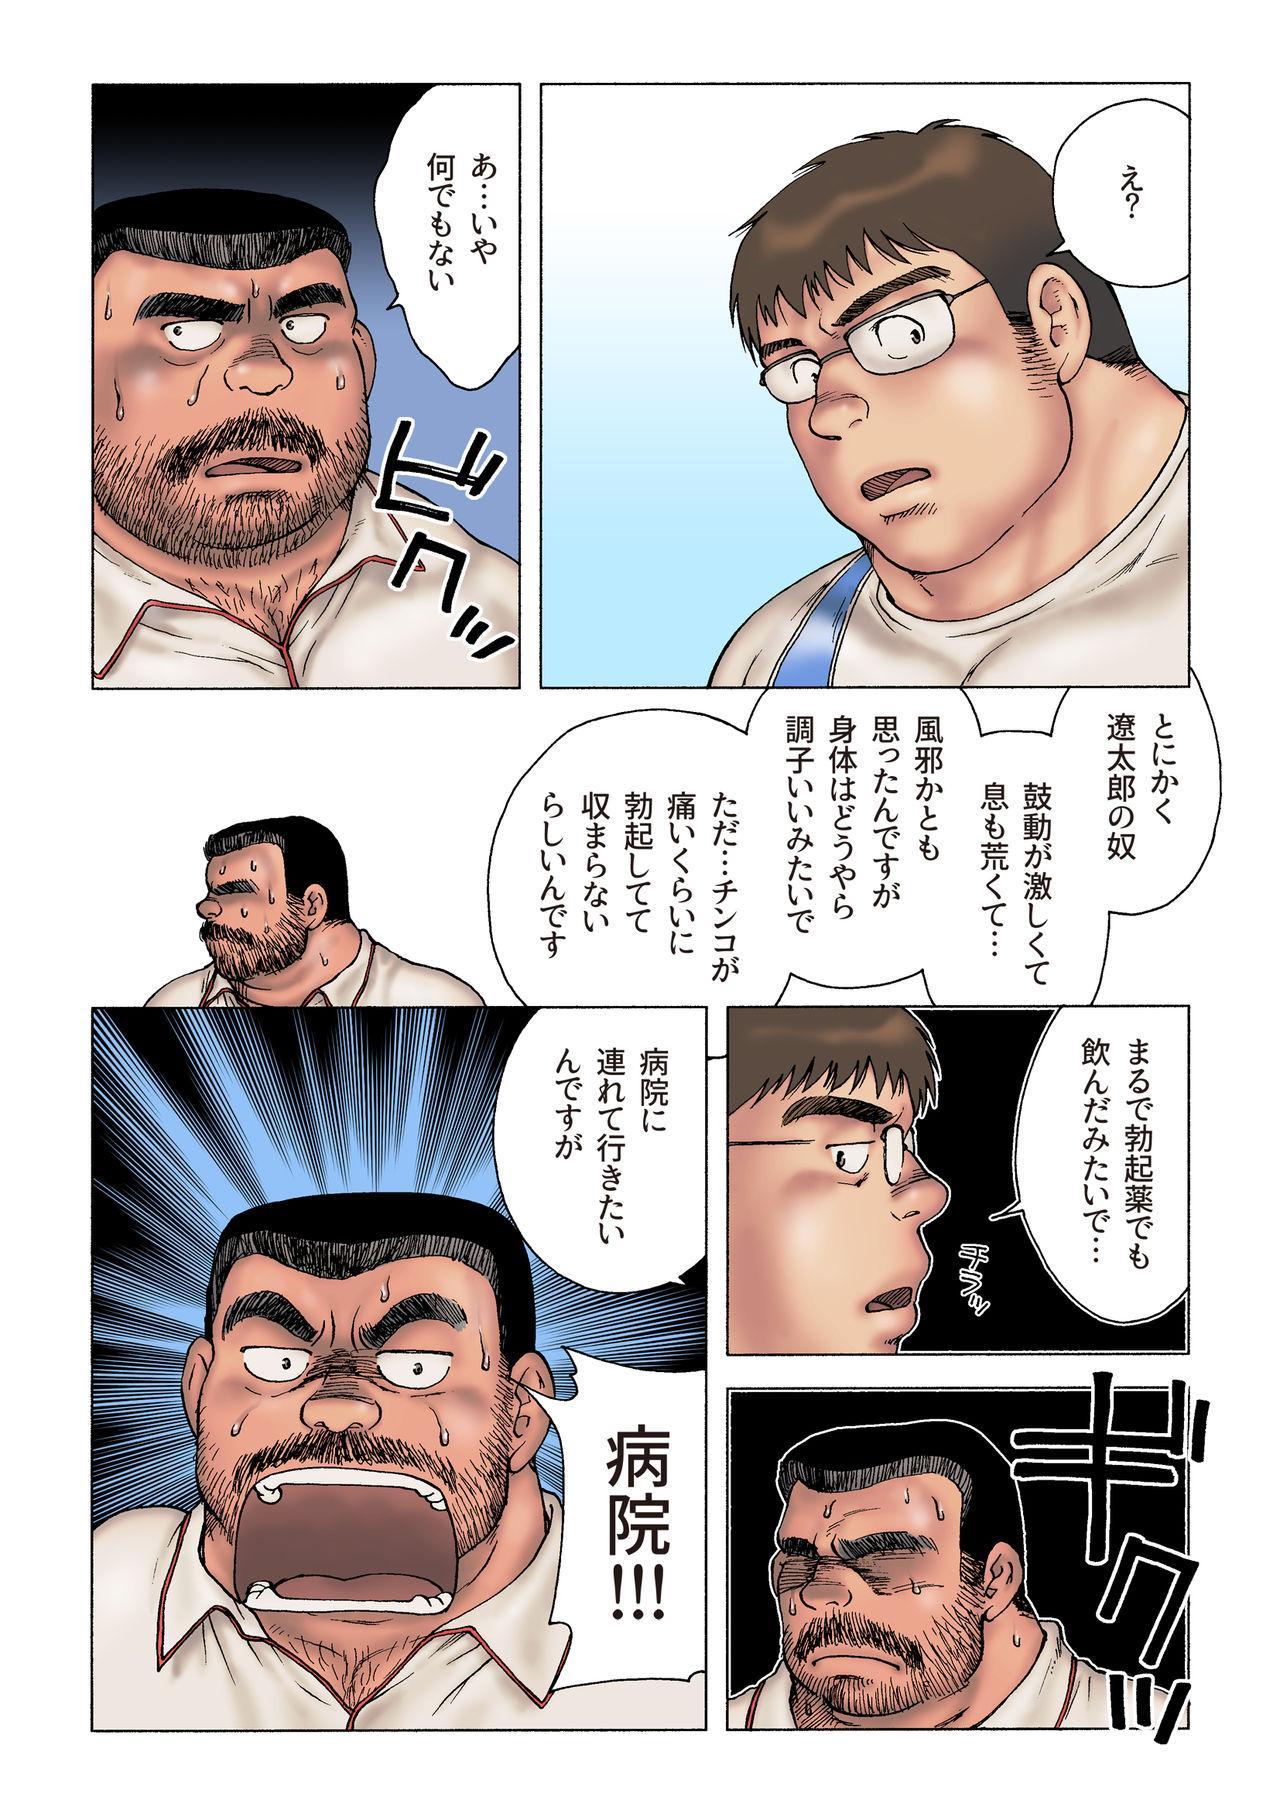 Danshi Koukousei Weightlifter Shiai-chuu, Osae kirenai Wakai Takeri 15